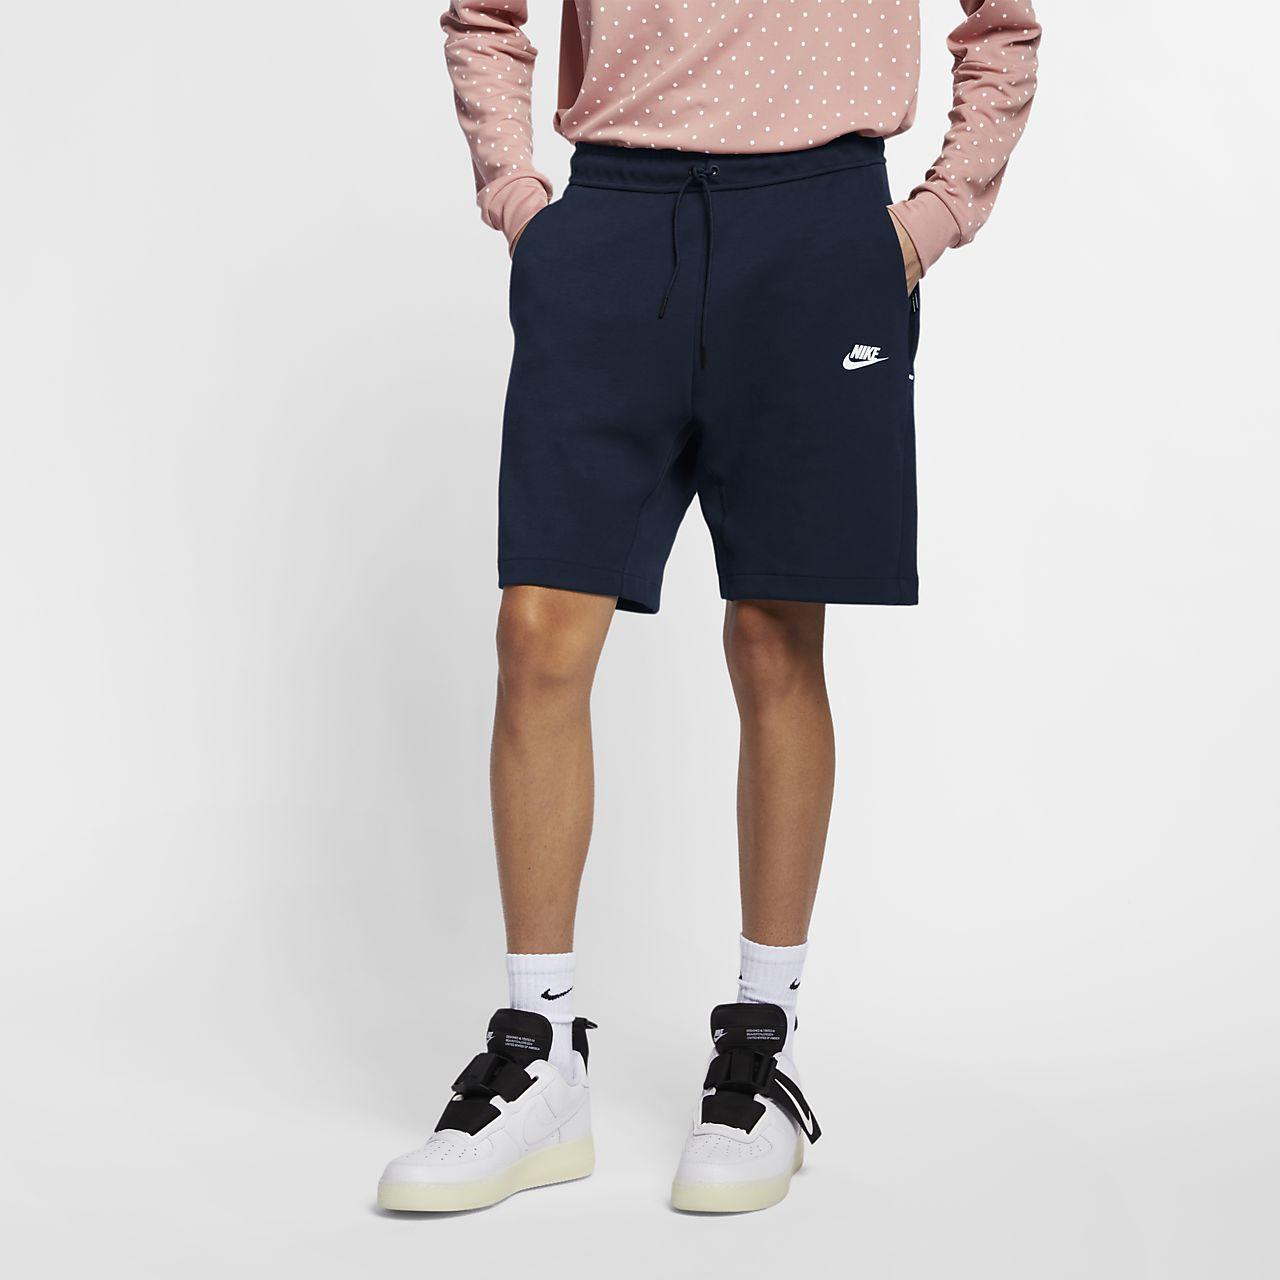 Nike Sportswear Tech Fleece Pantalons curts de teixit Fleece - Home